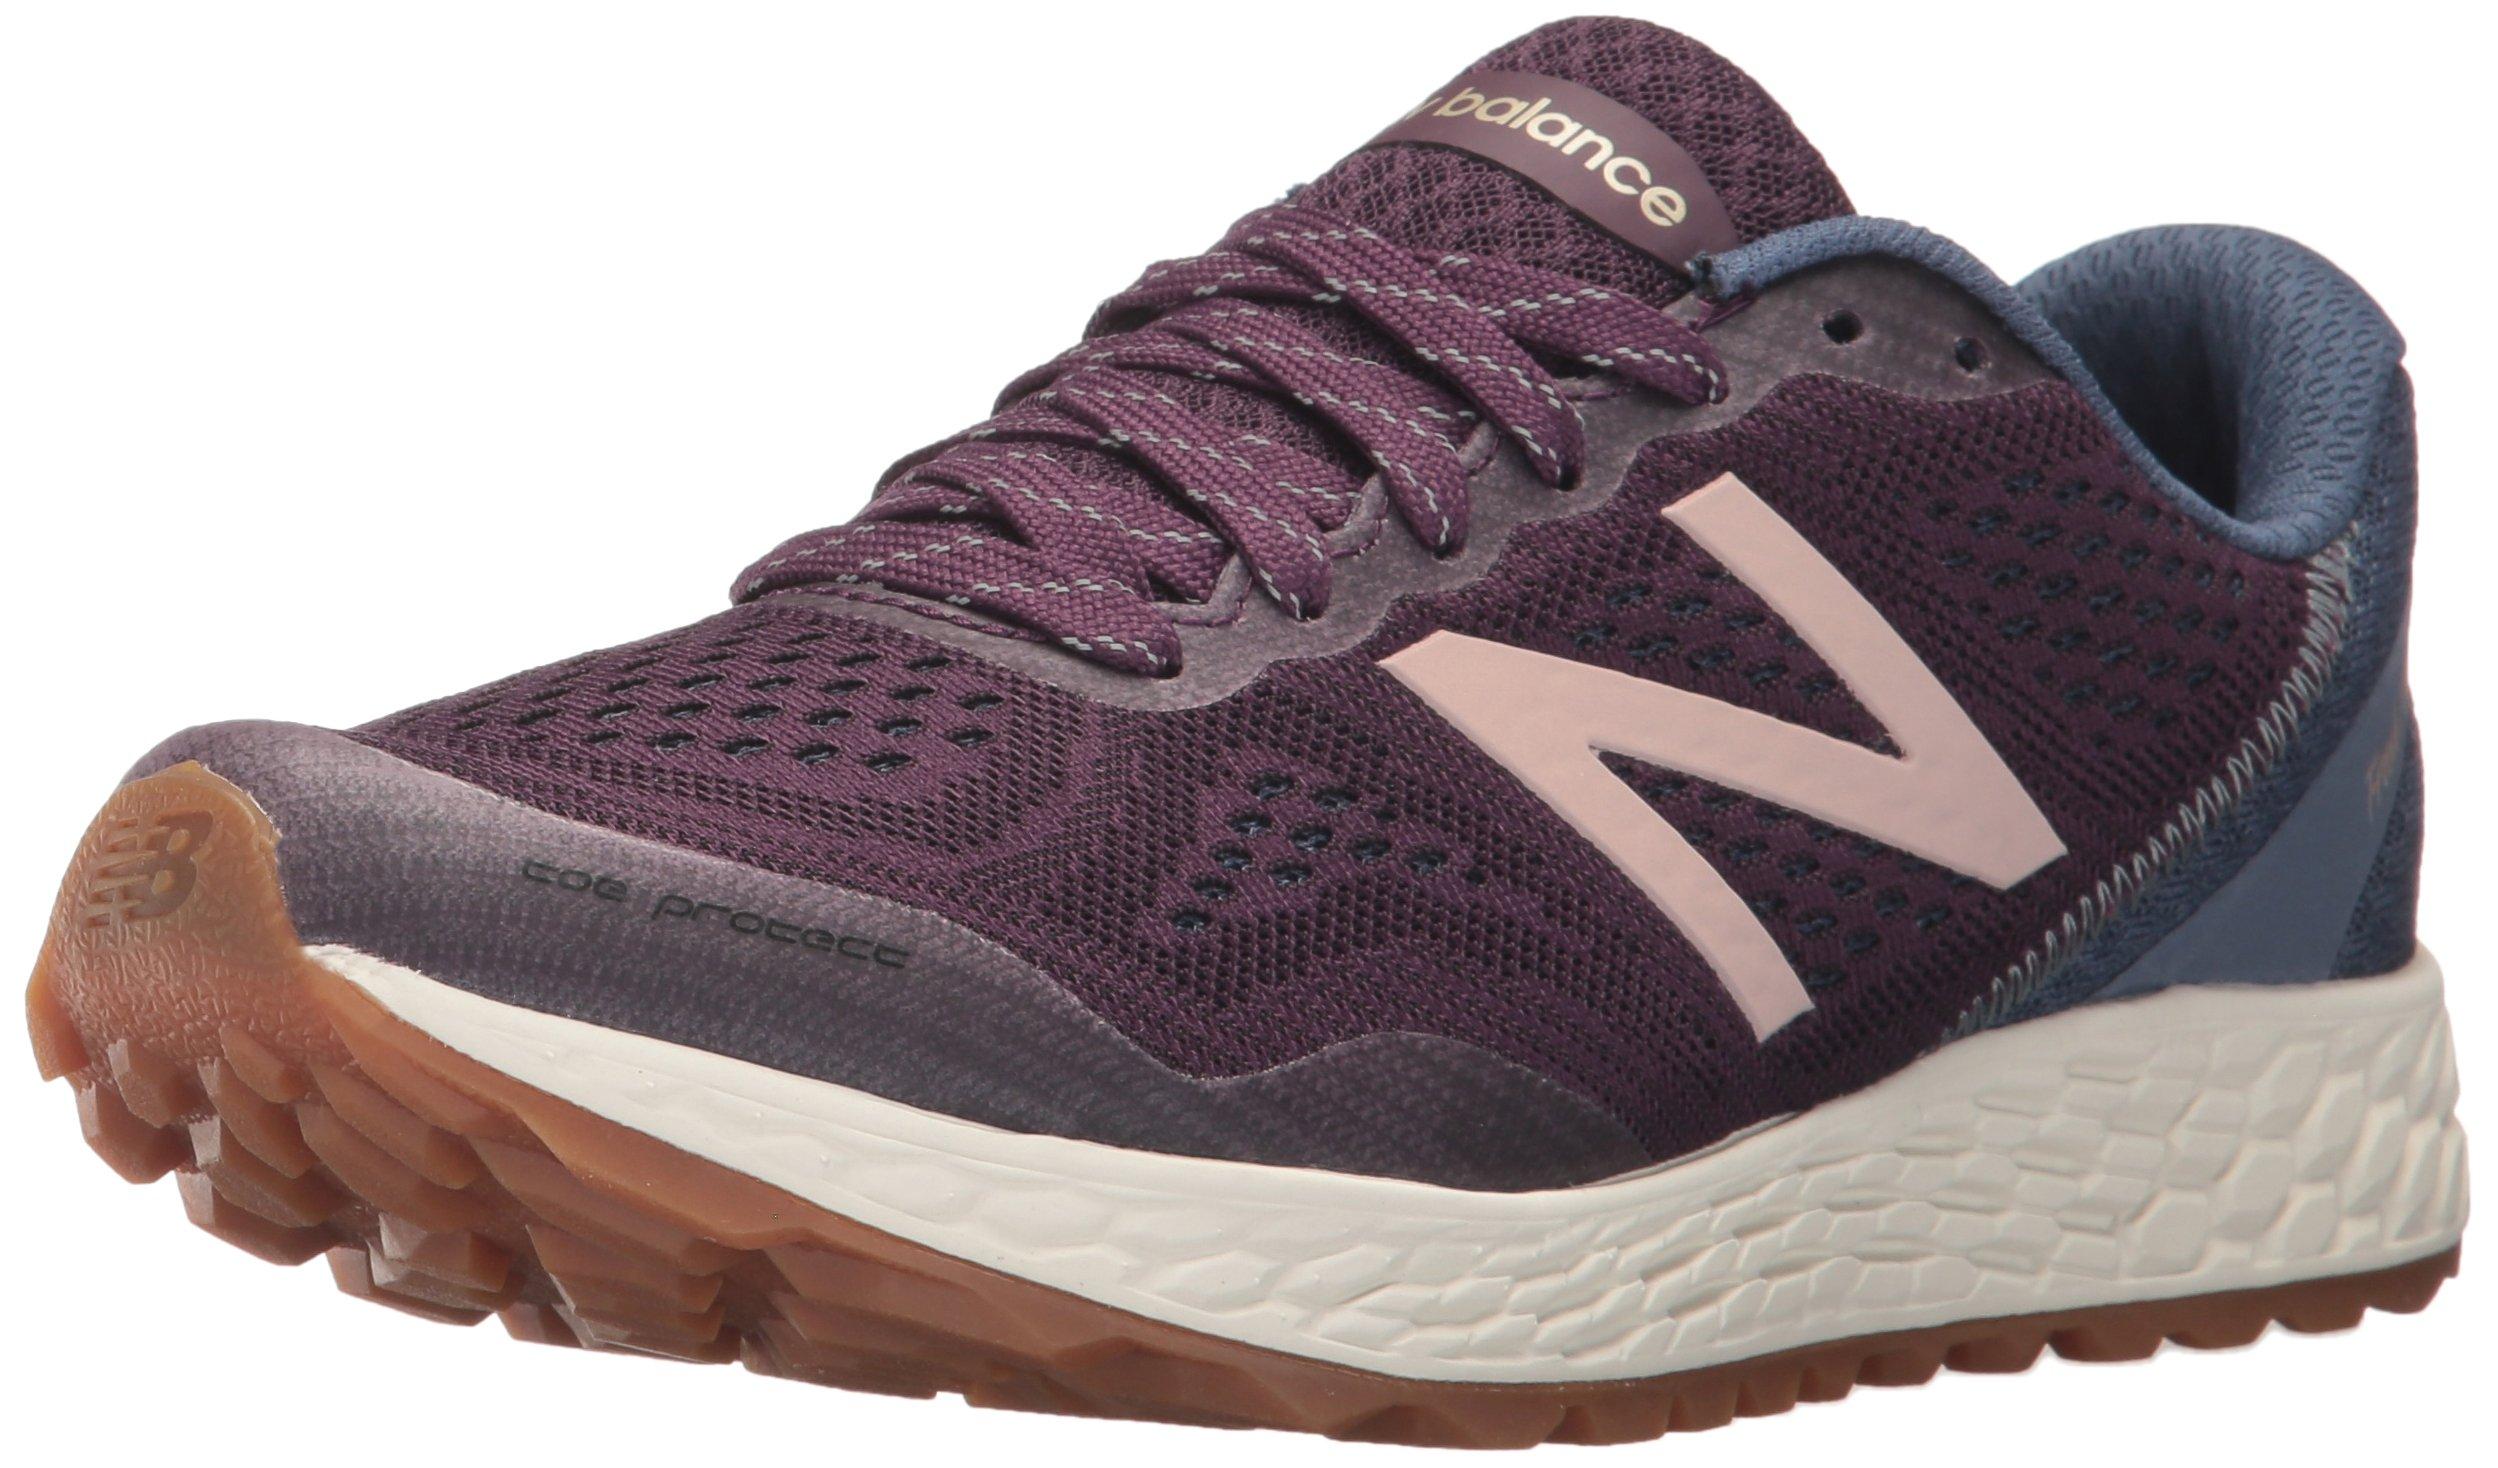 New Balance Women's GOBIV2 Running Shoe, Aubergine/Vintage Indigo, 8 B US